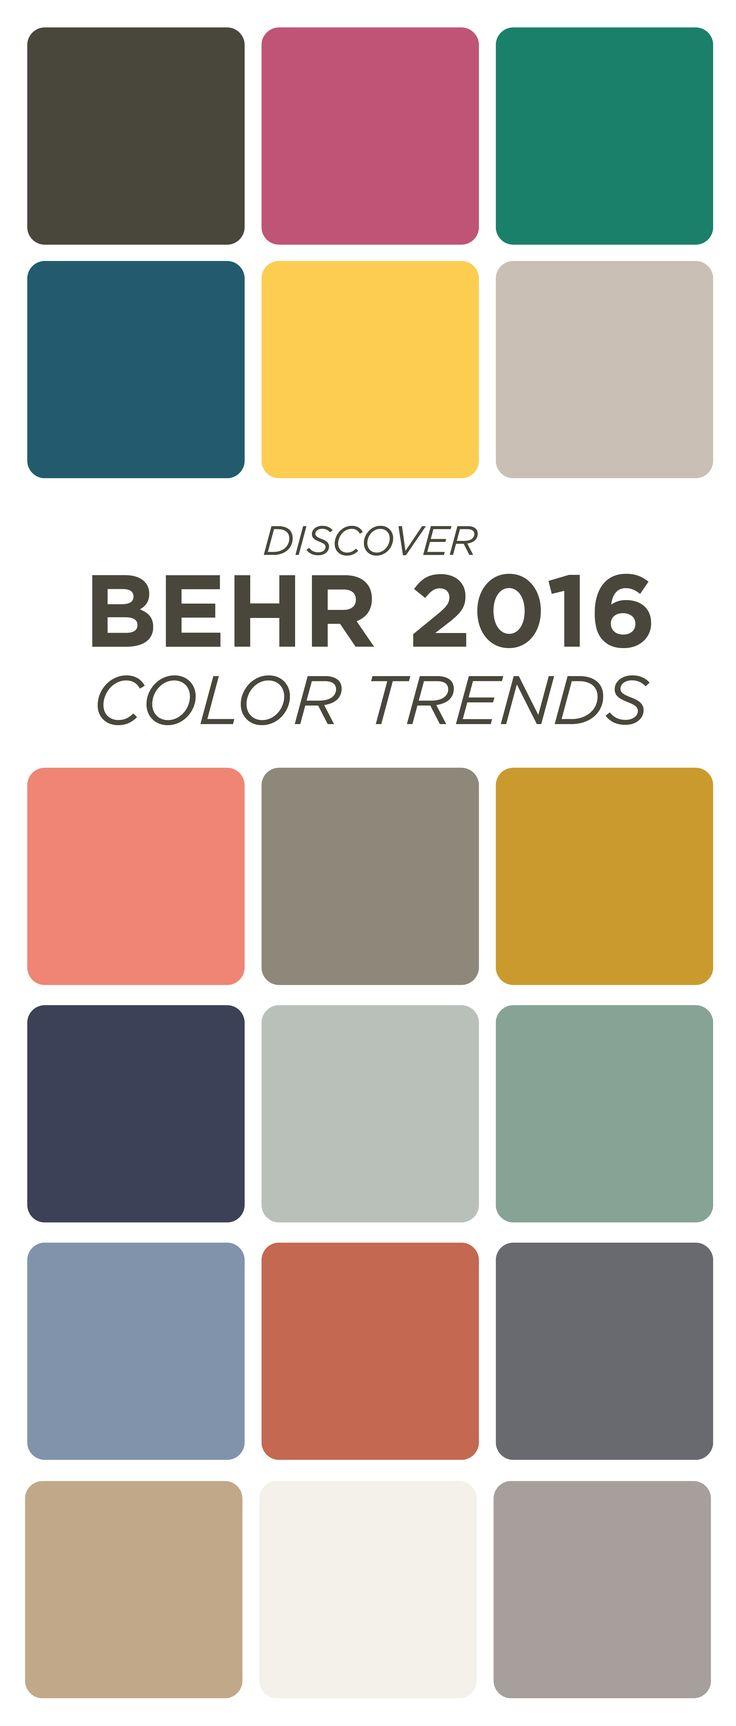 Paint Combinations 104 best behr 2016 color trends images on pinterest   color trends